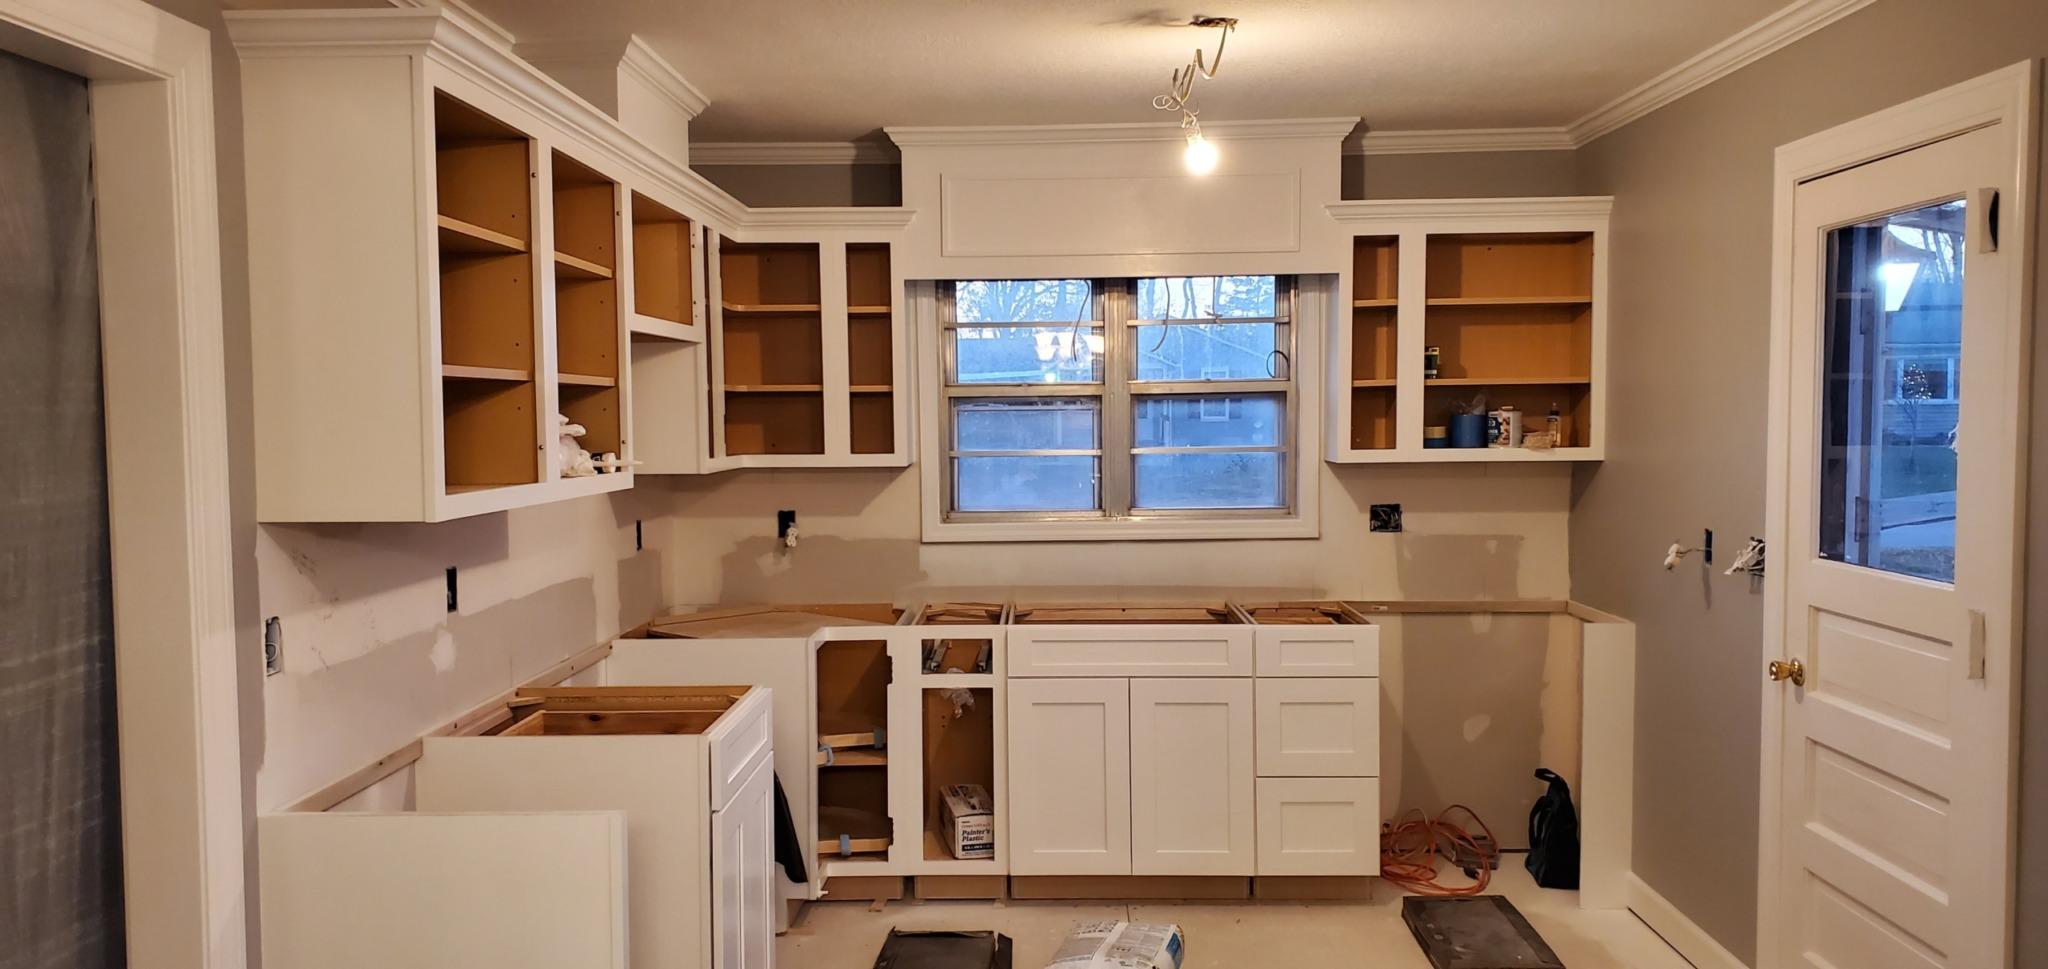 Cabinet Kitchen Remodel 7